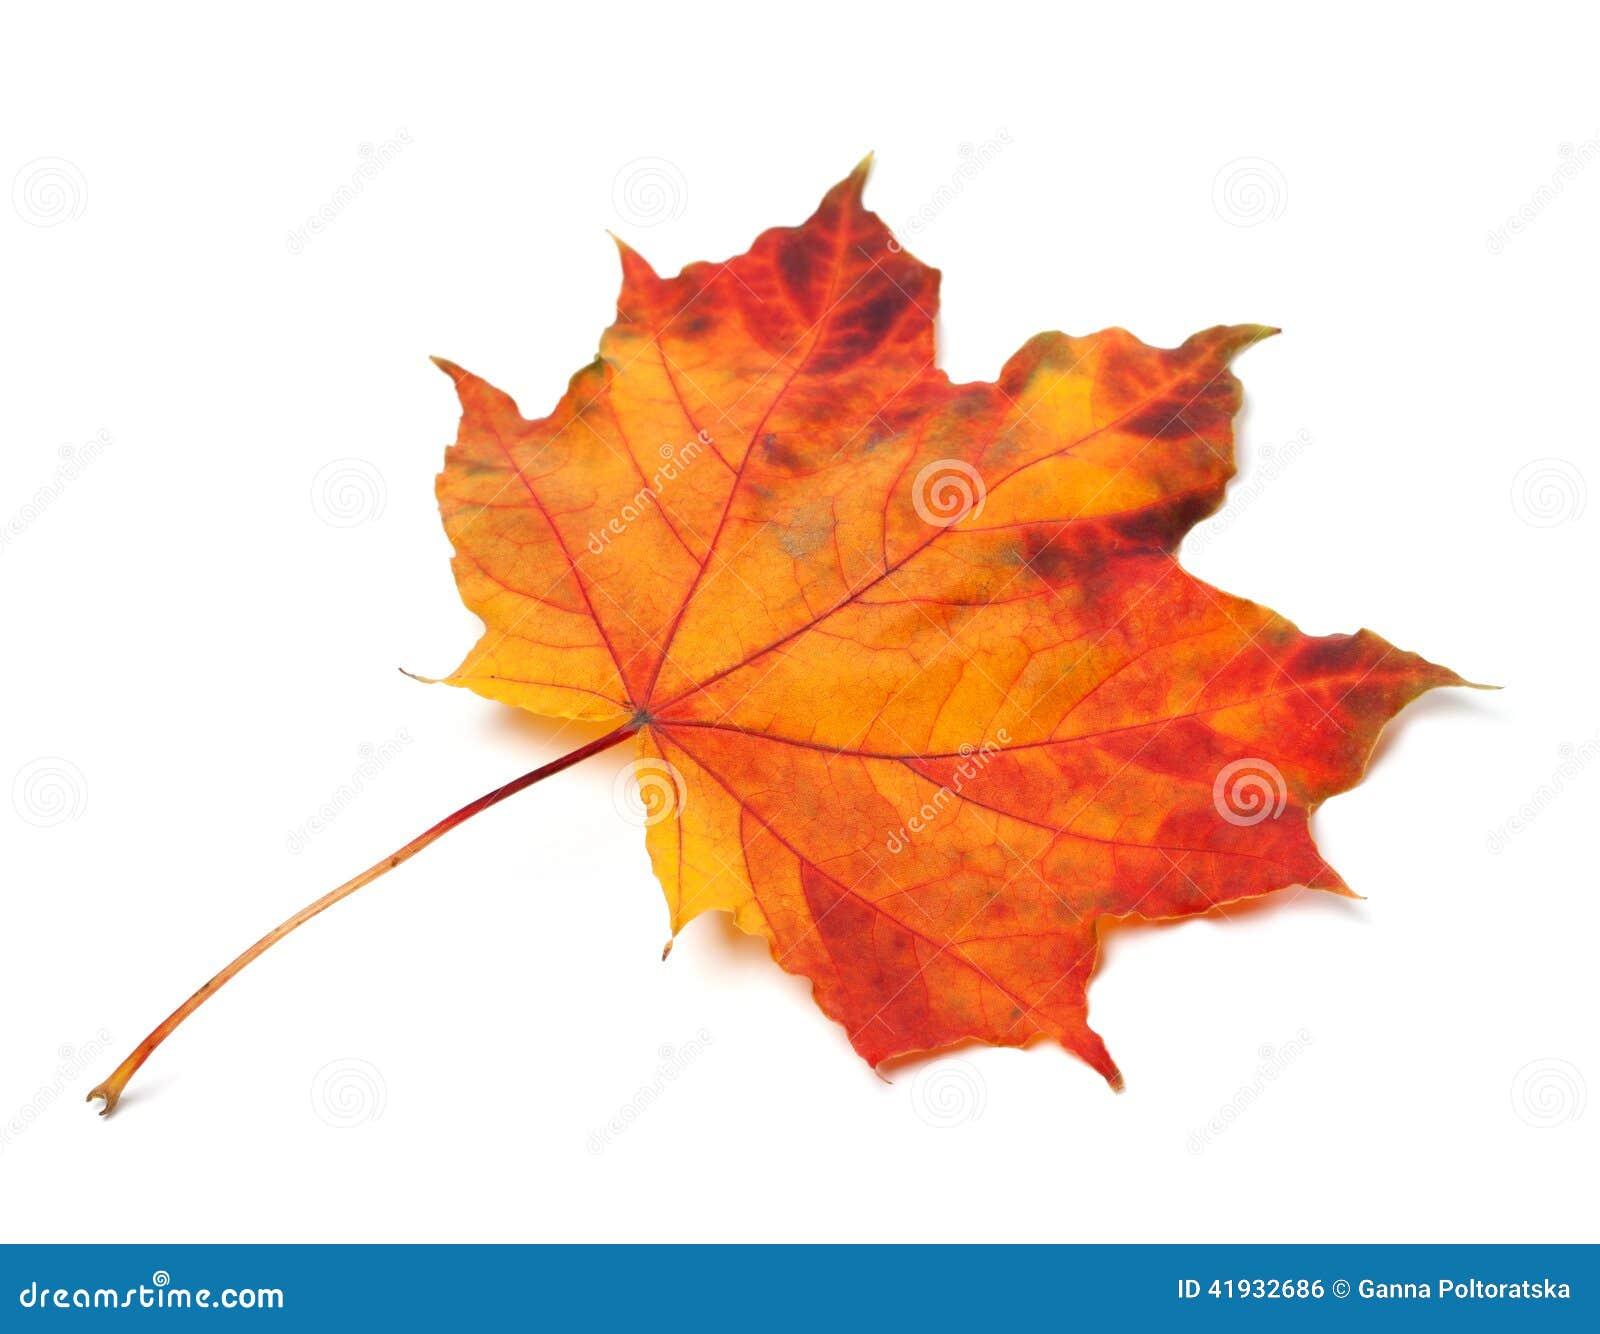 Rable feuille orange d 39 automne photo stock image 41932686 - Image feuille automne ...